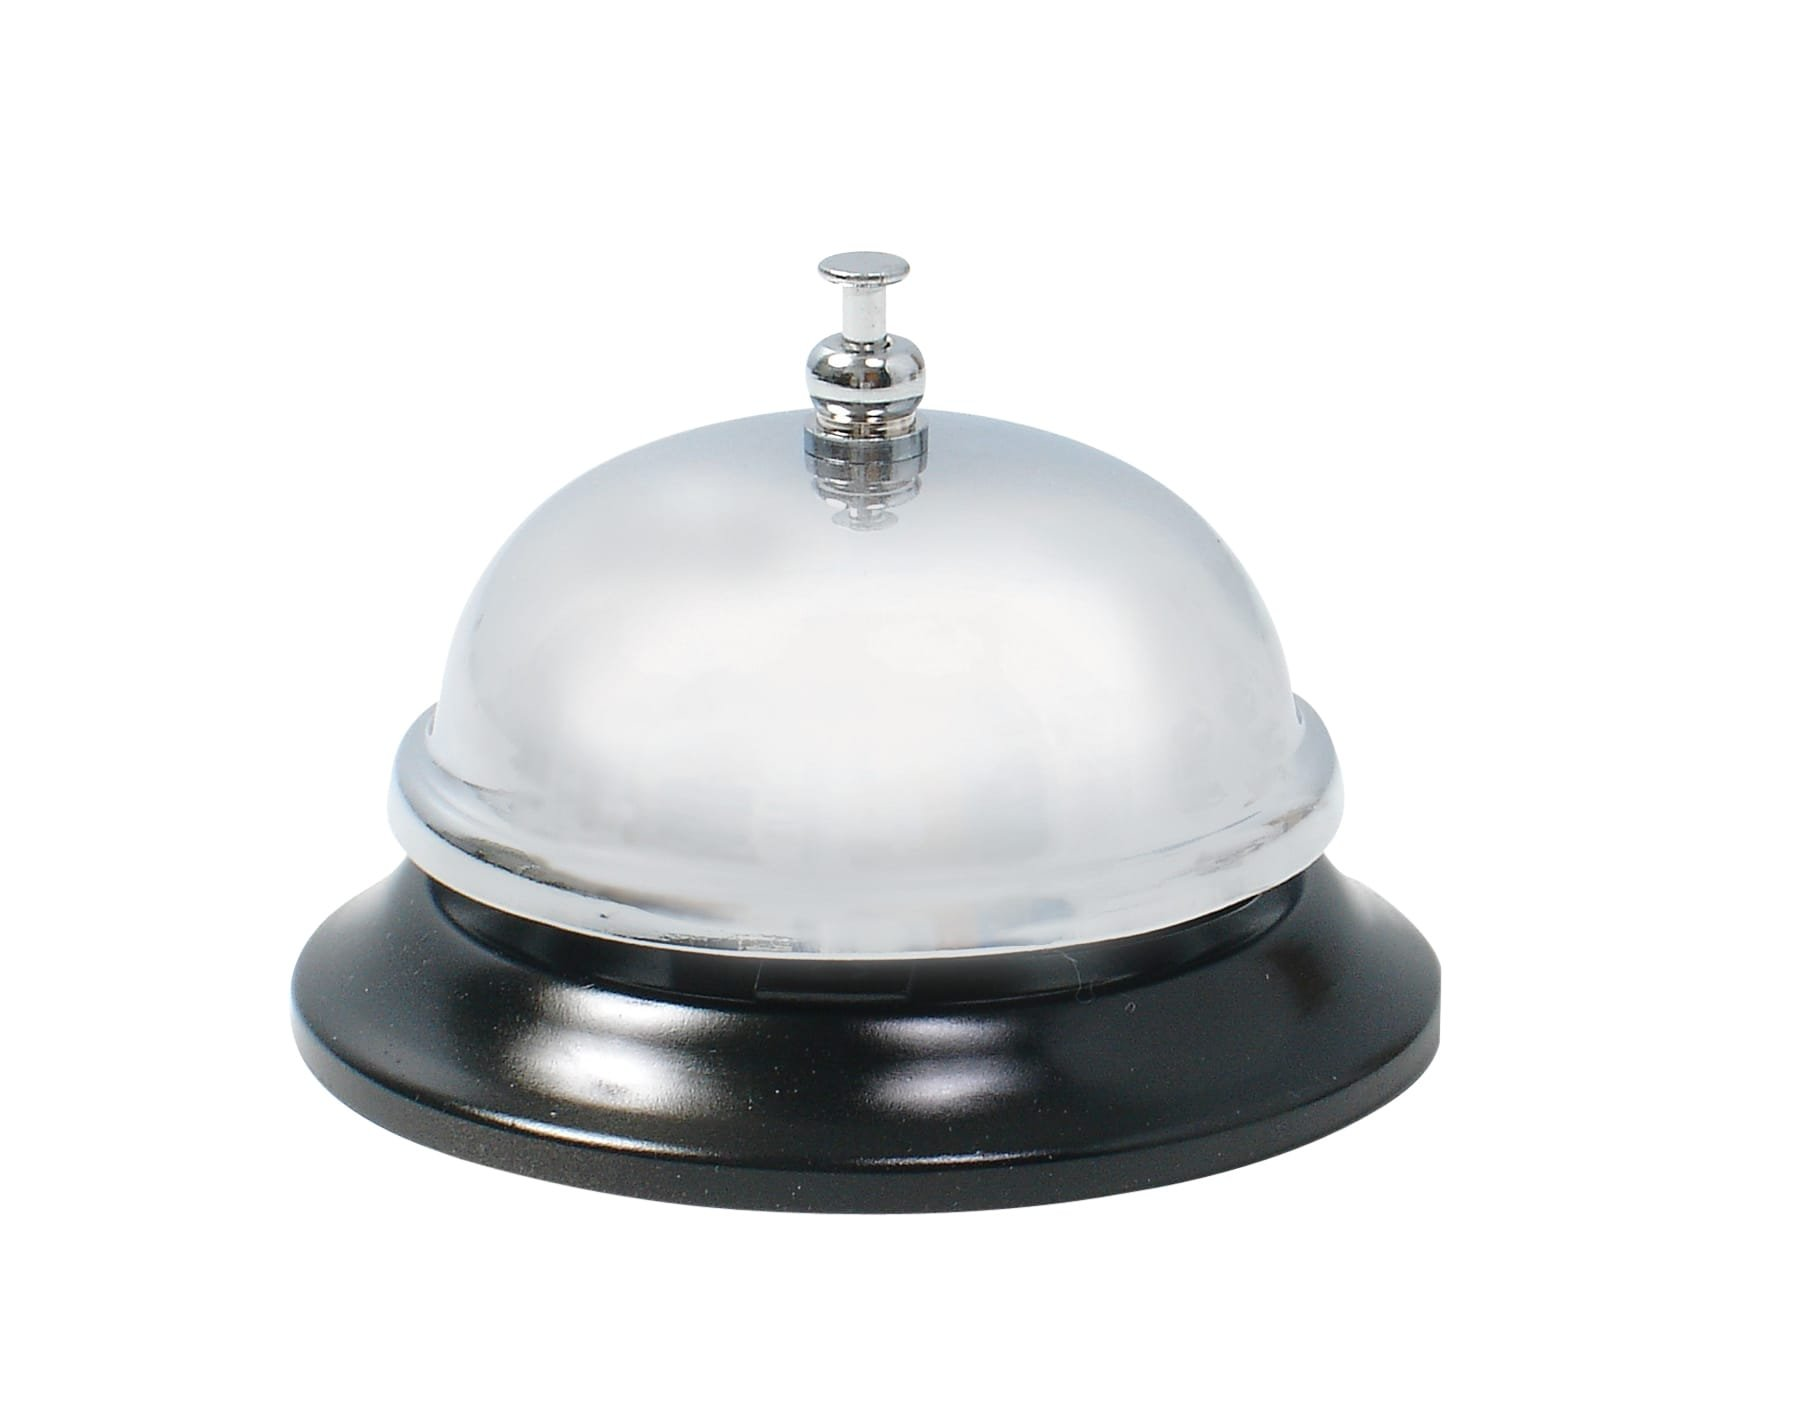 Baumgartens Desktop Call Bell 1 Each Chrome (Pack of 48) (43060)